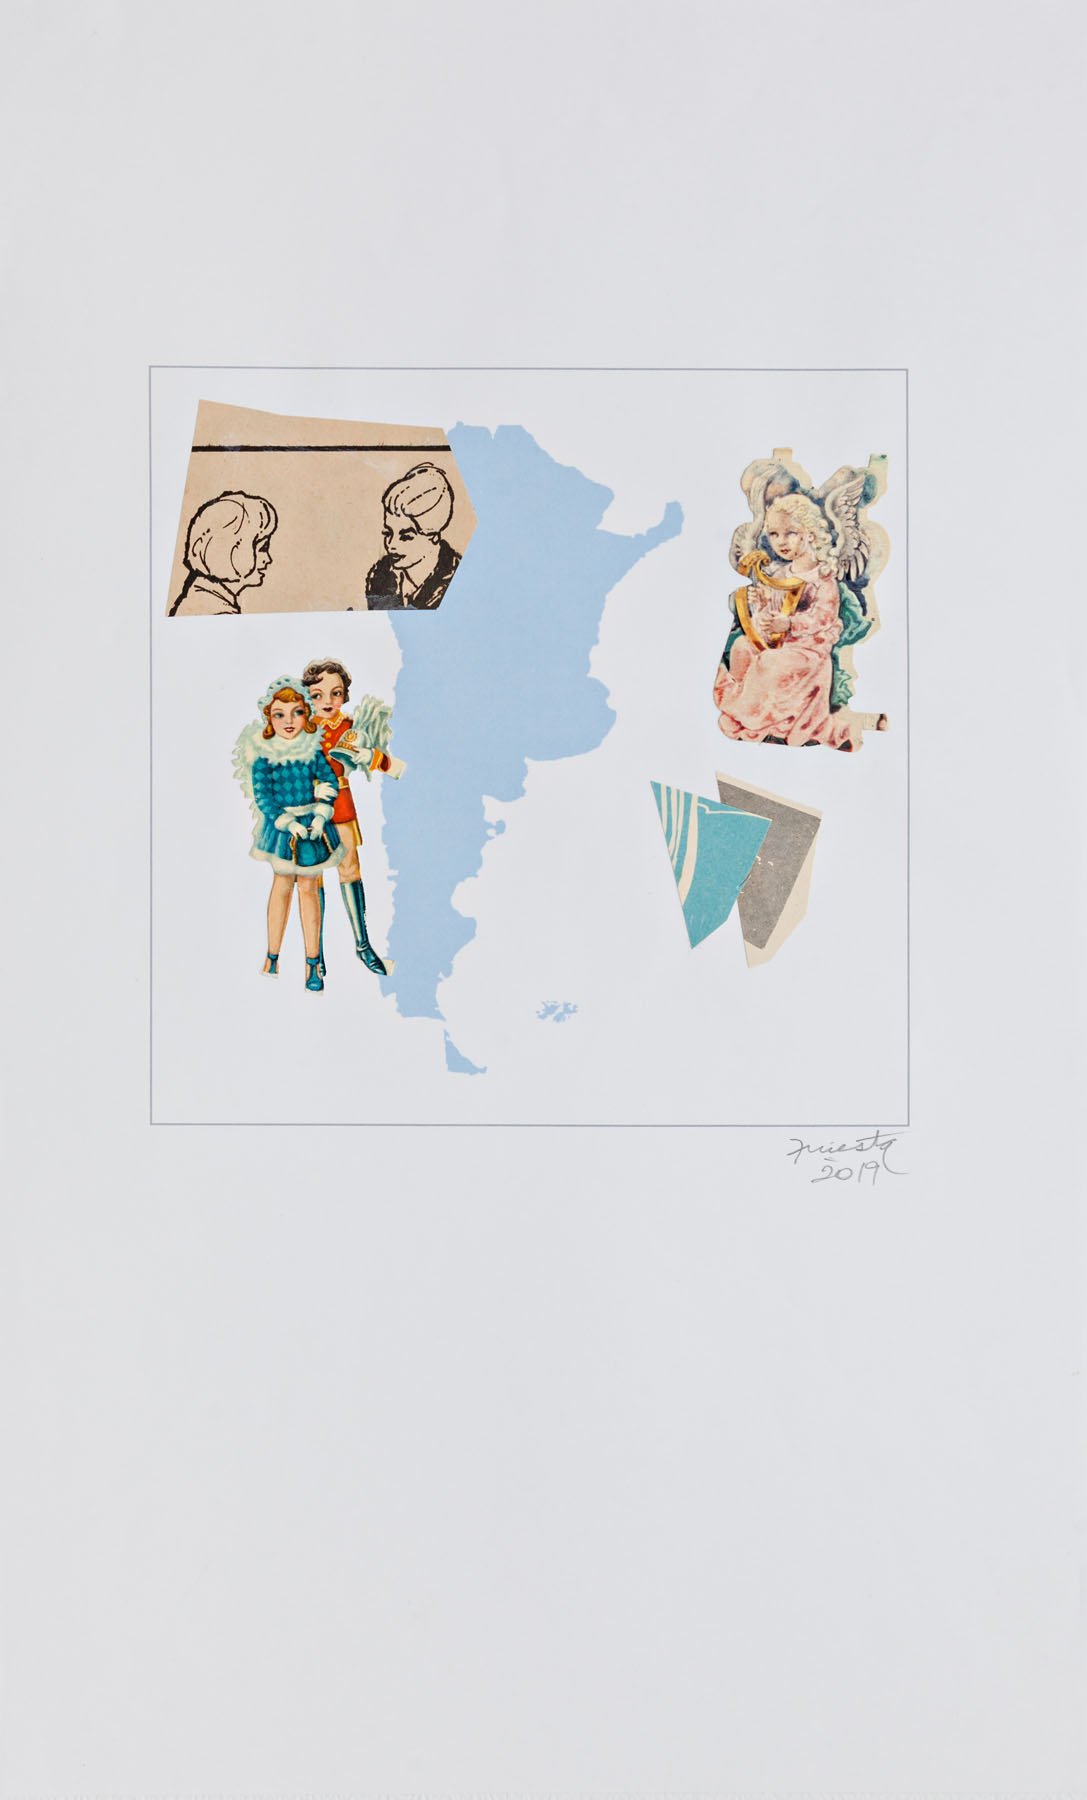 Serie verano, papel collage, 35,5 cm x 21,5 cm, 2020